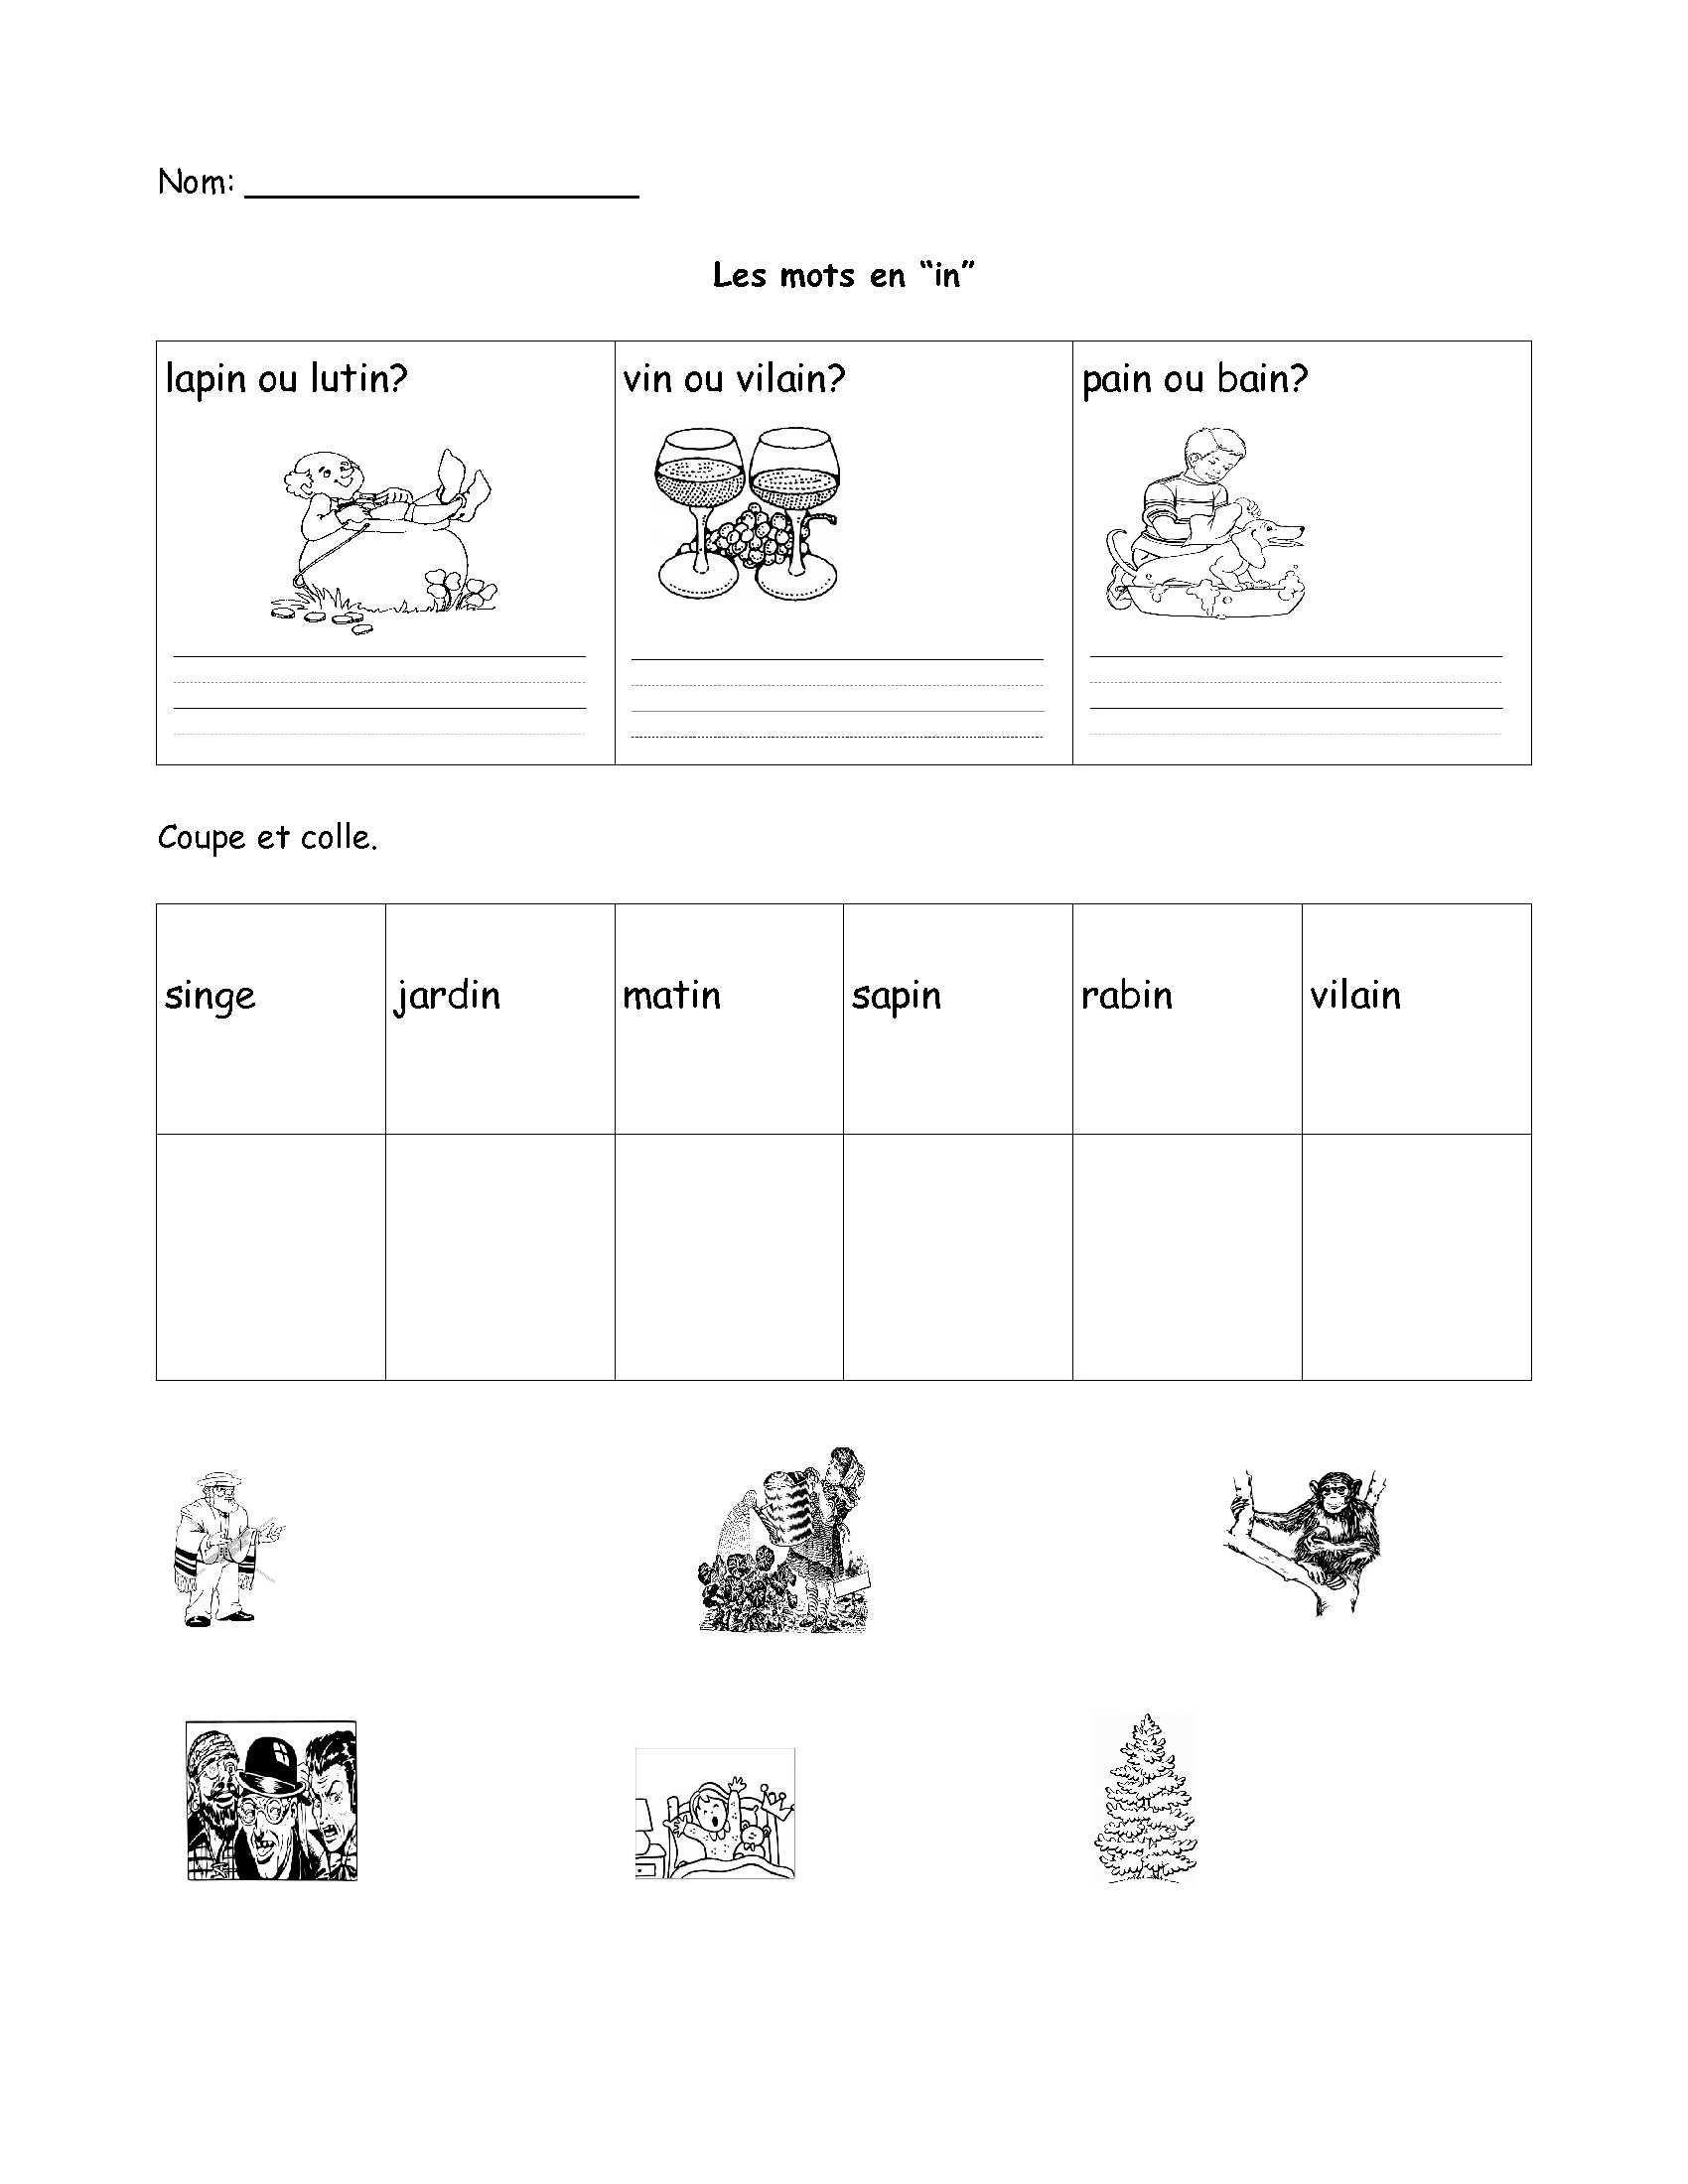 French Printable Worksheets 3 Esl Worksheets for Preschool Worksheets Schools